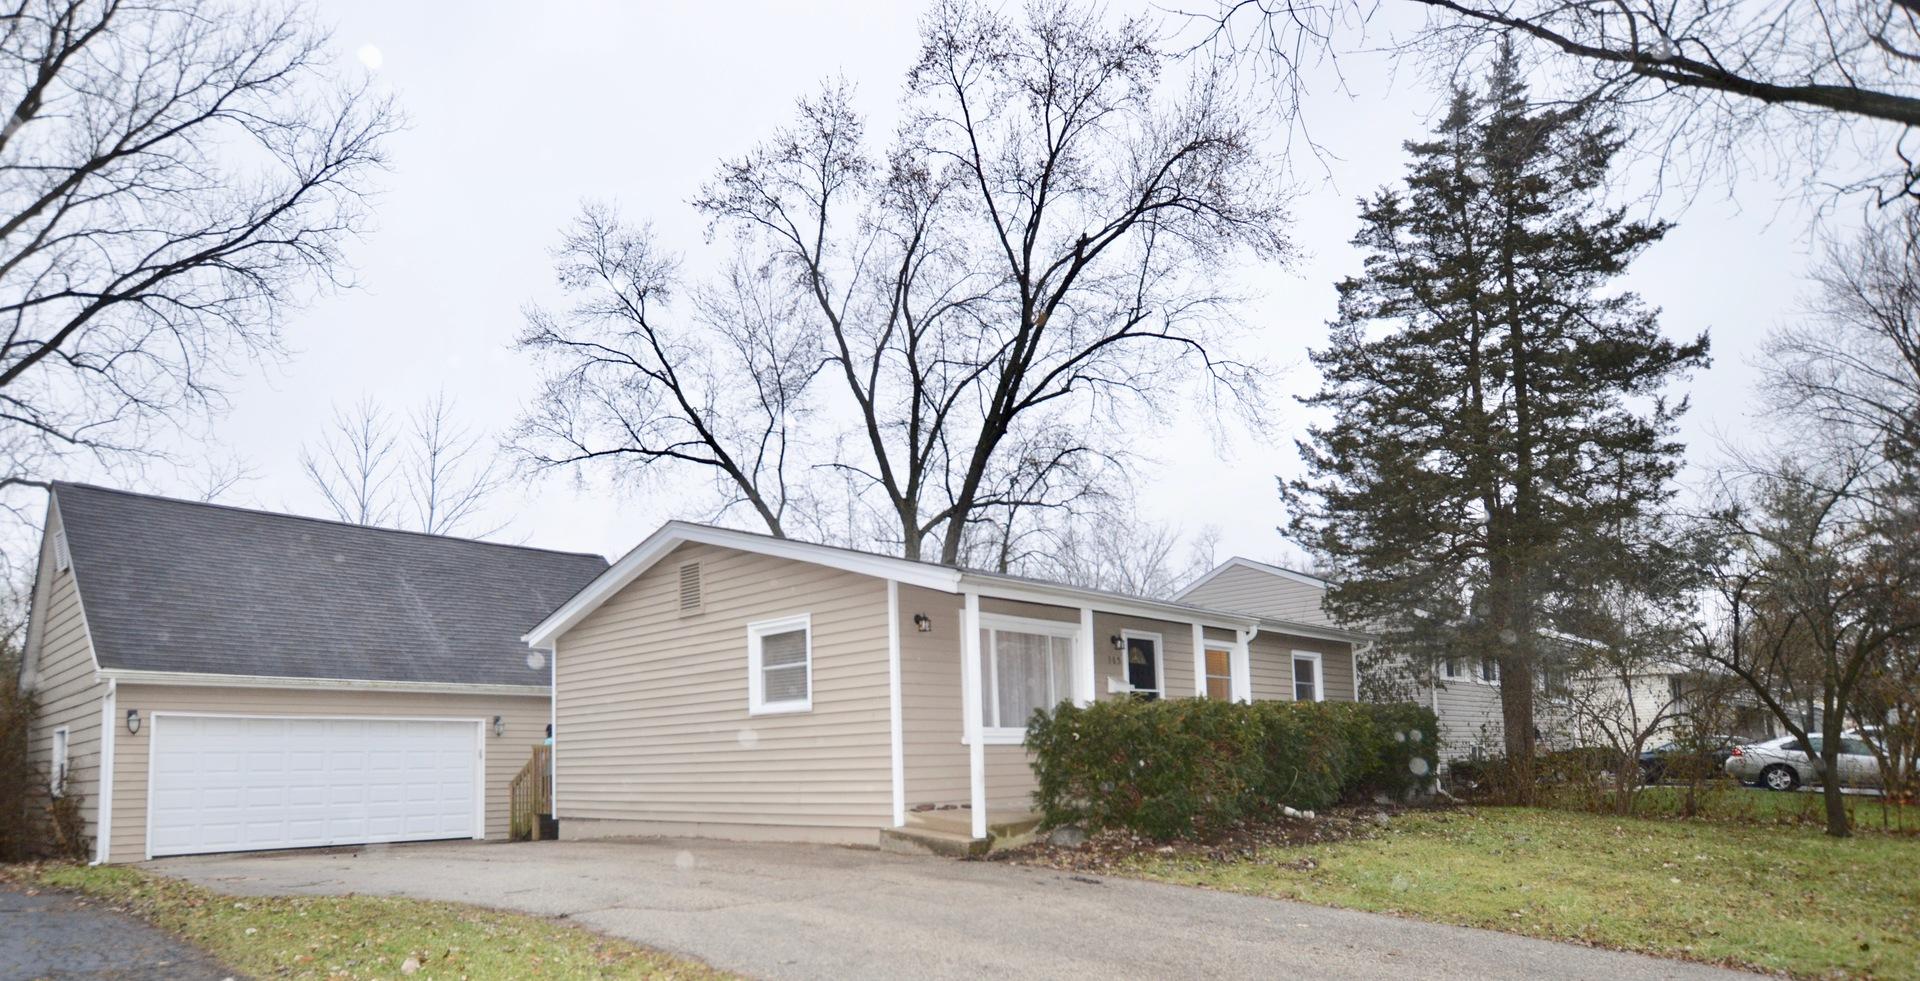 385 Willow Road, Wauconda, Illinois 60084